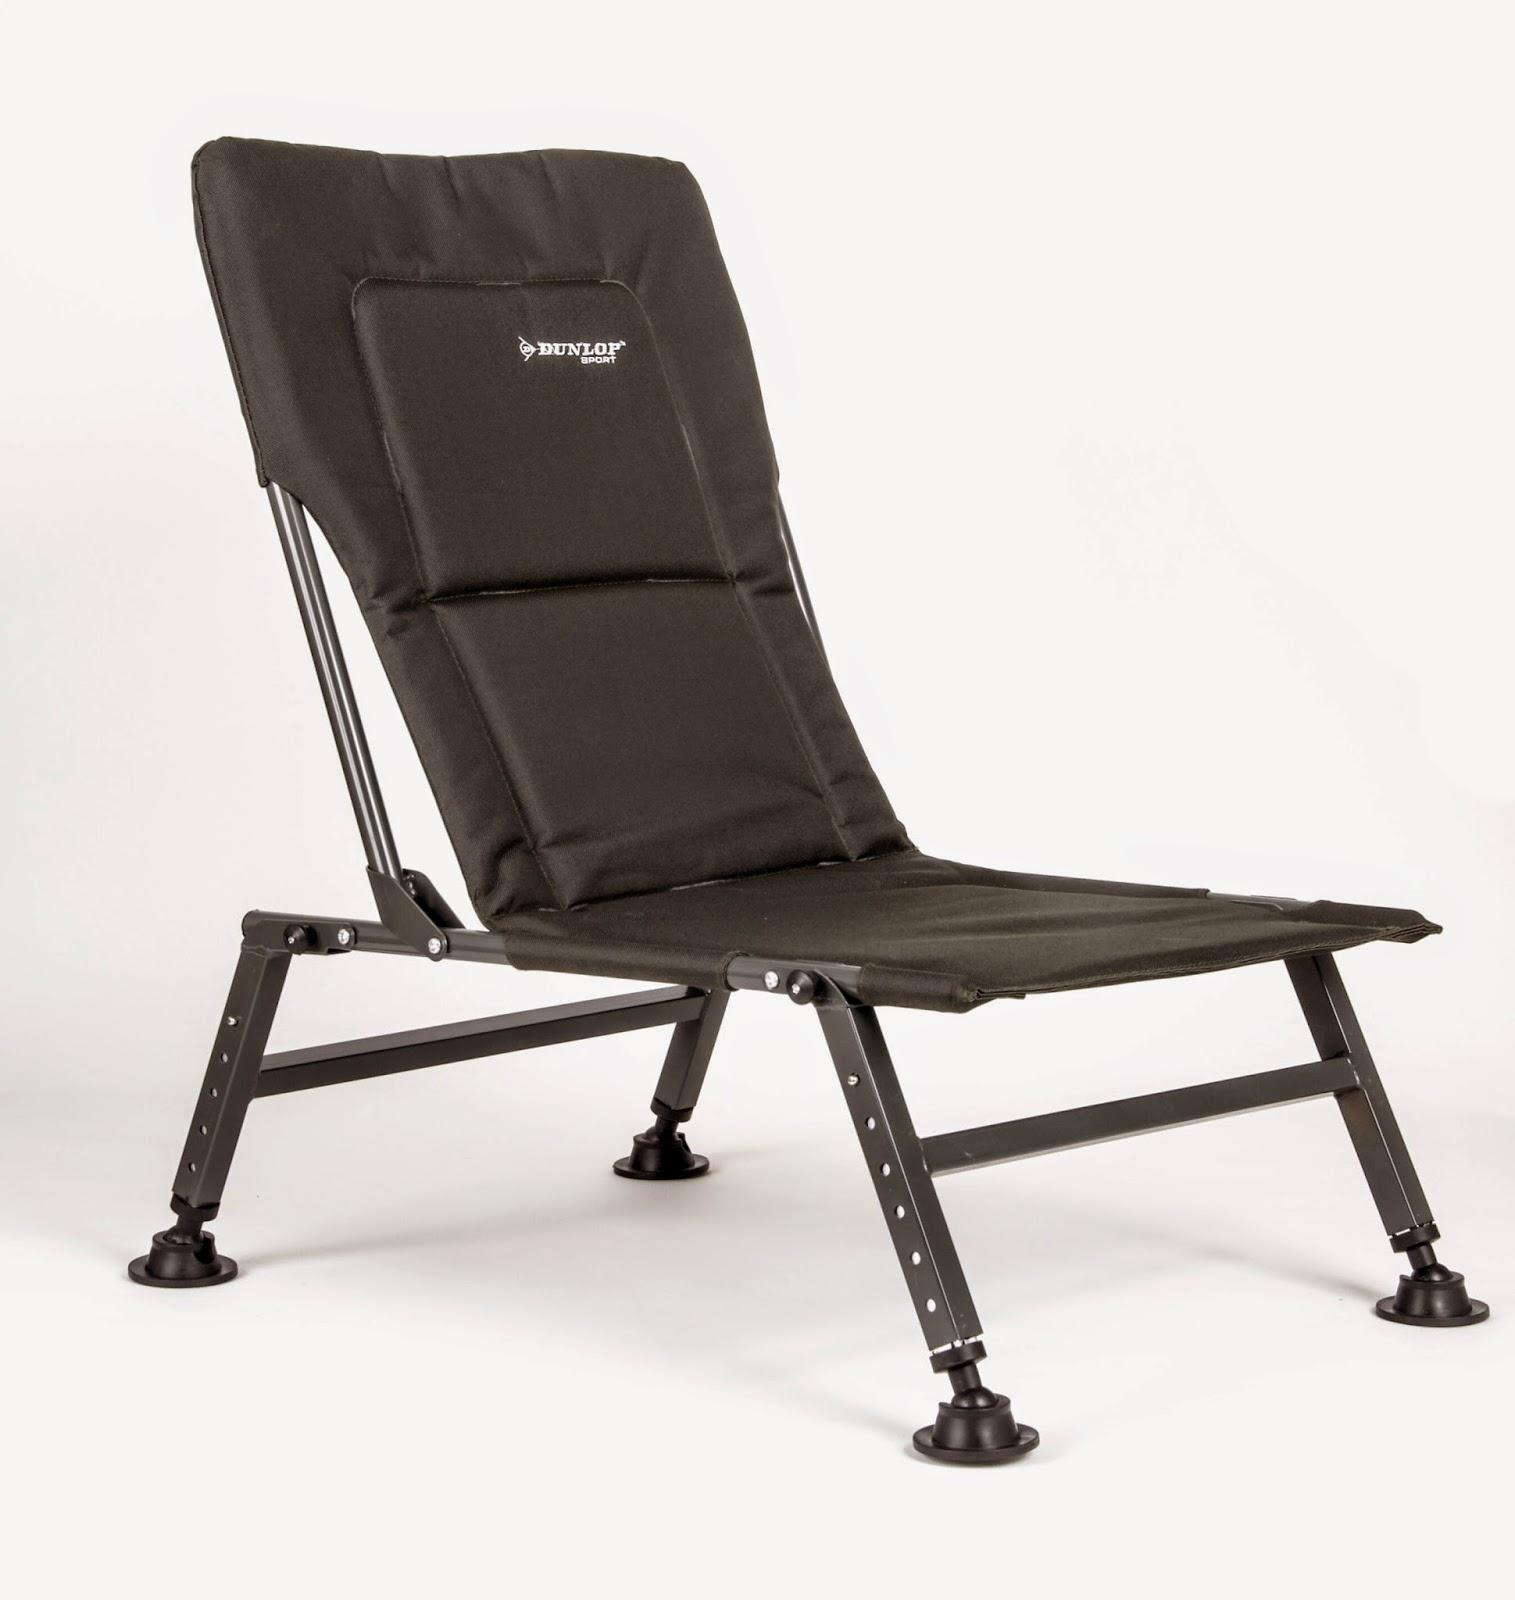 Fishing Chair Argos Wooden Beach How To Drown Maggots Tomorrow